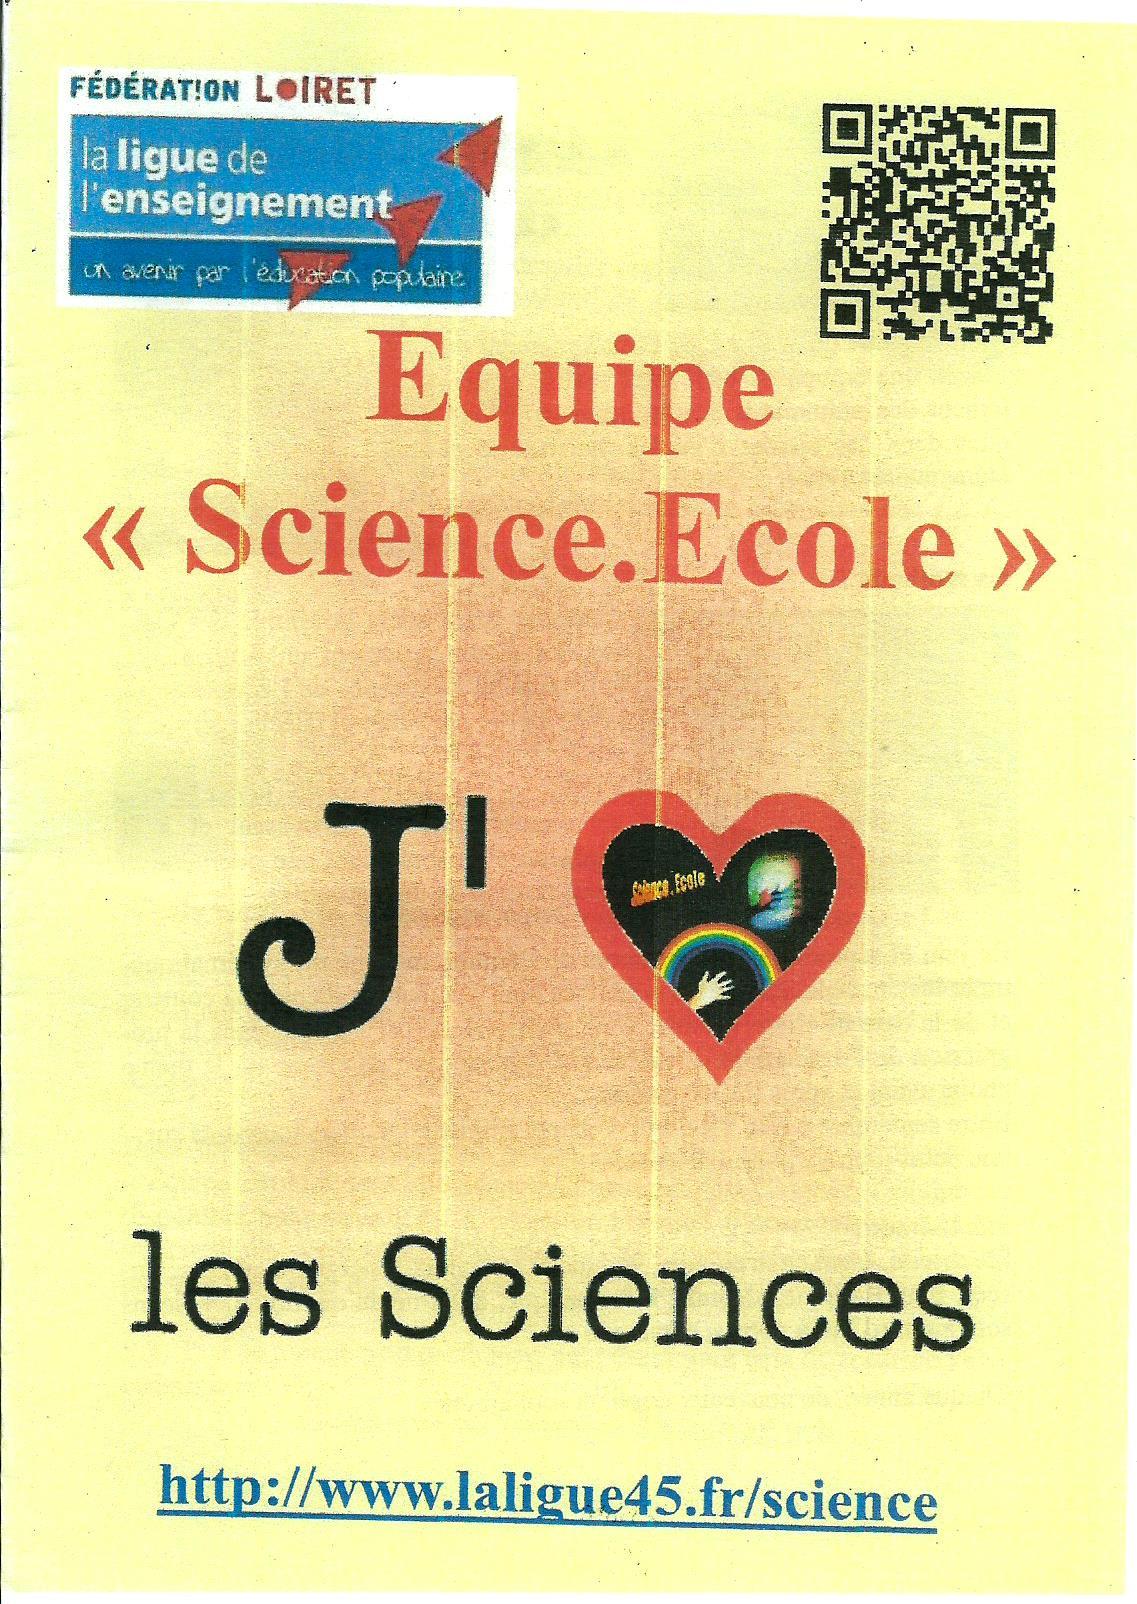 Scan Equipe  Science.Ecole  2018 (07.04.2018).jpg